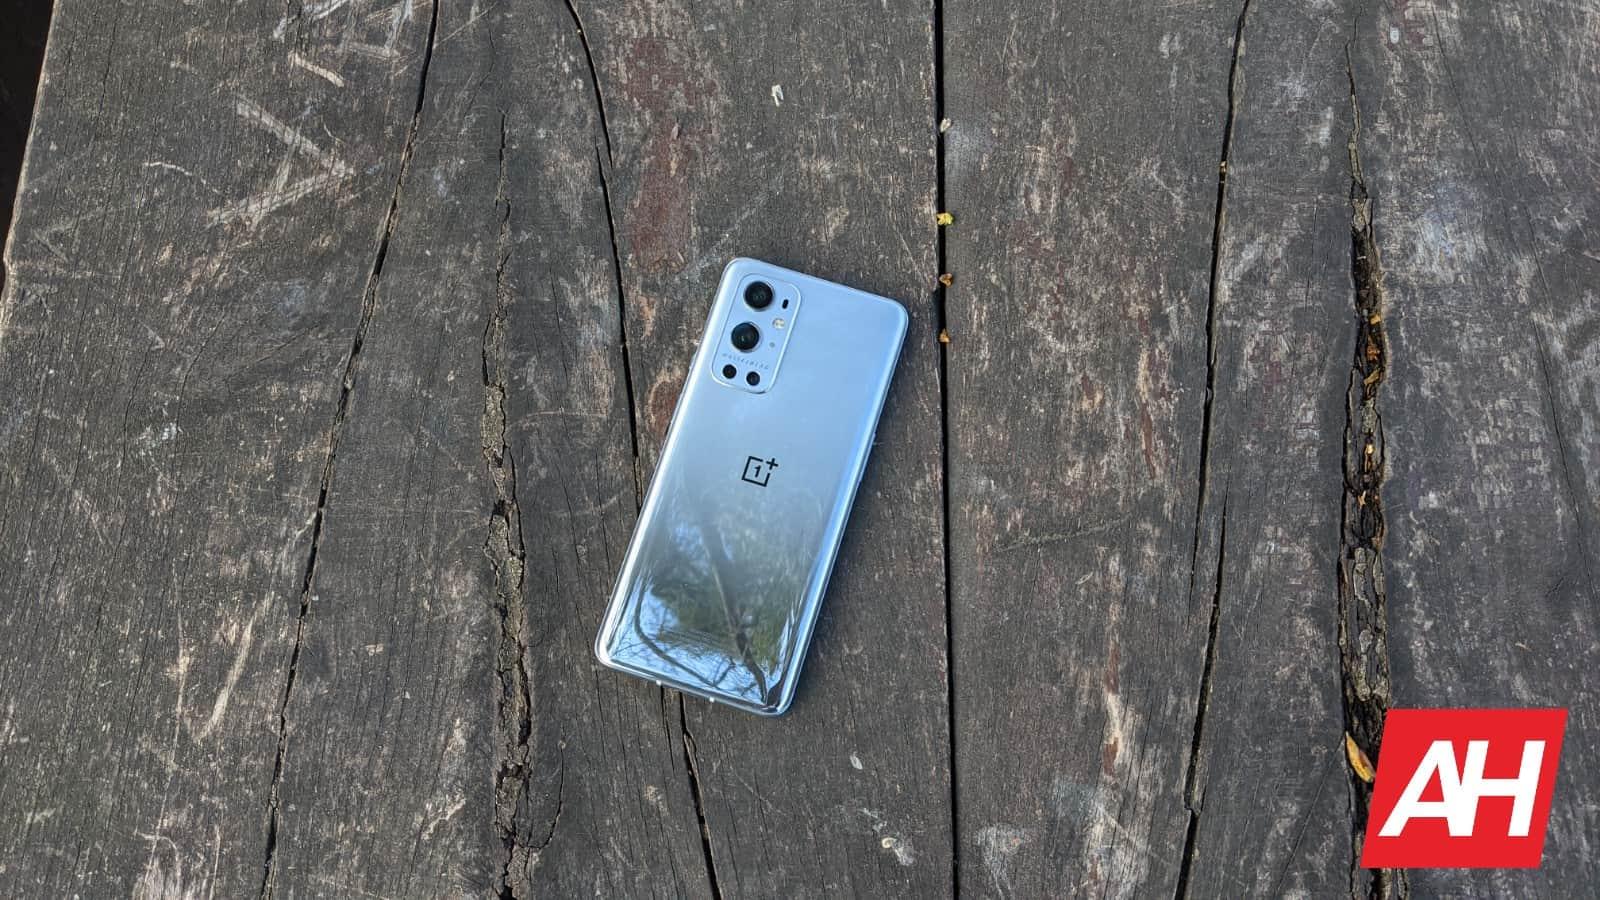 Imagem 1 AH OnePlus 9 Pro KL